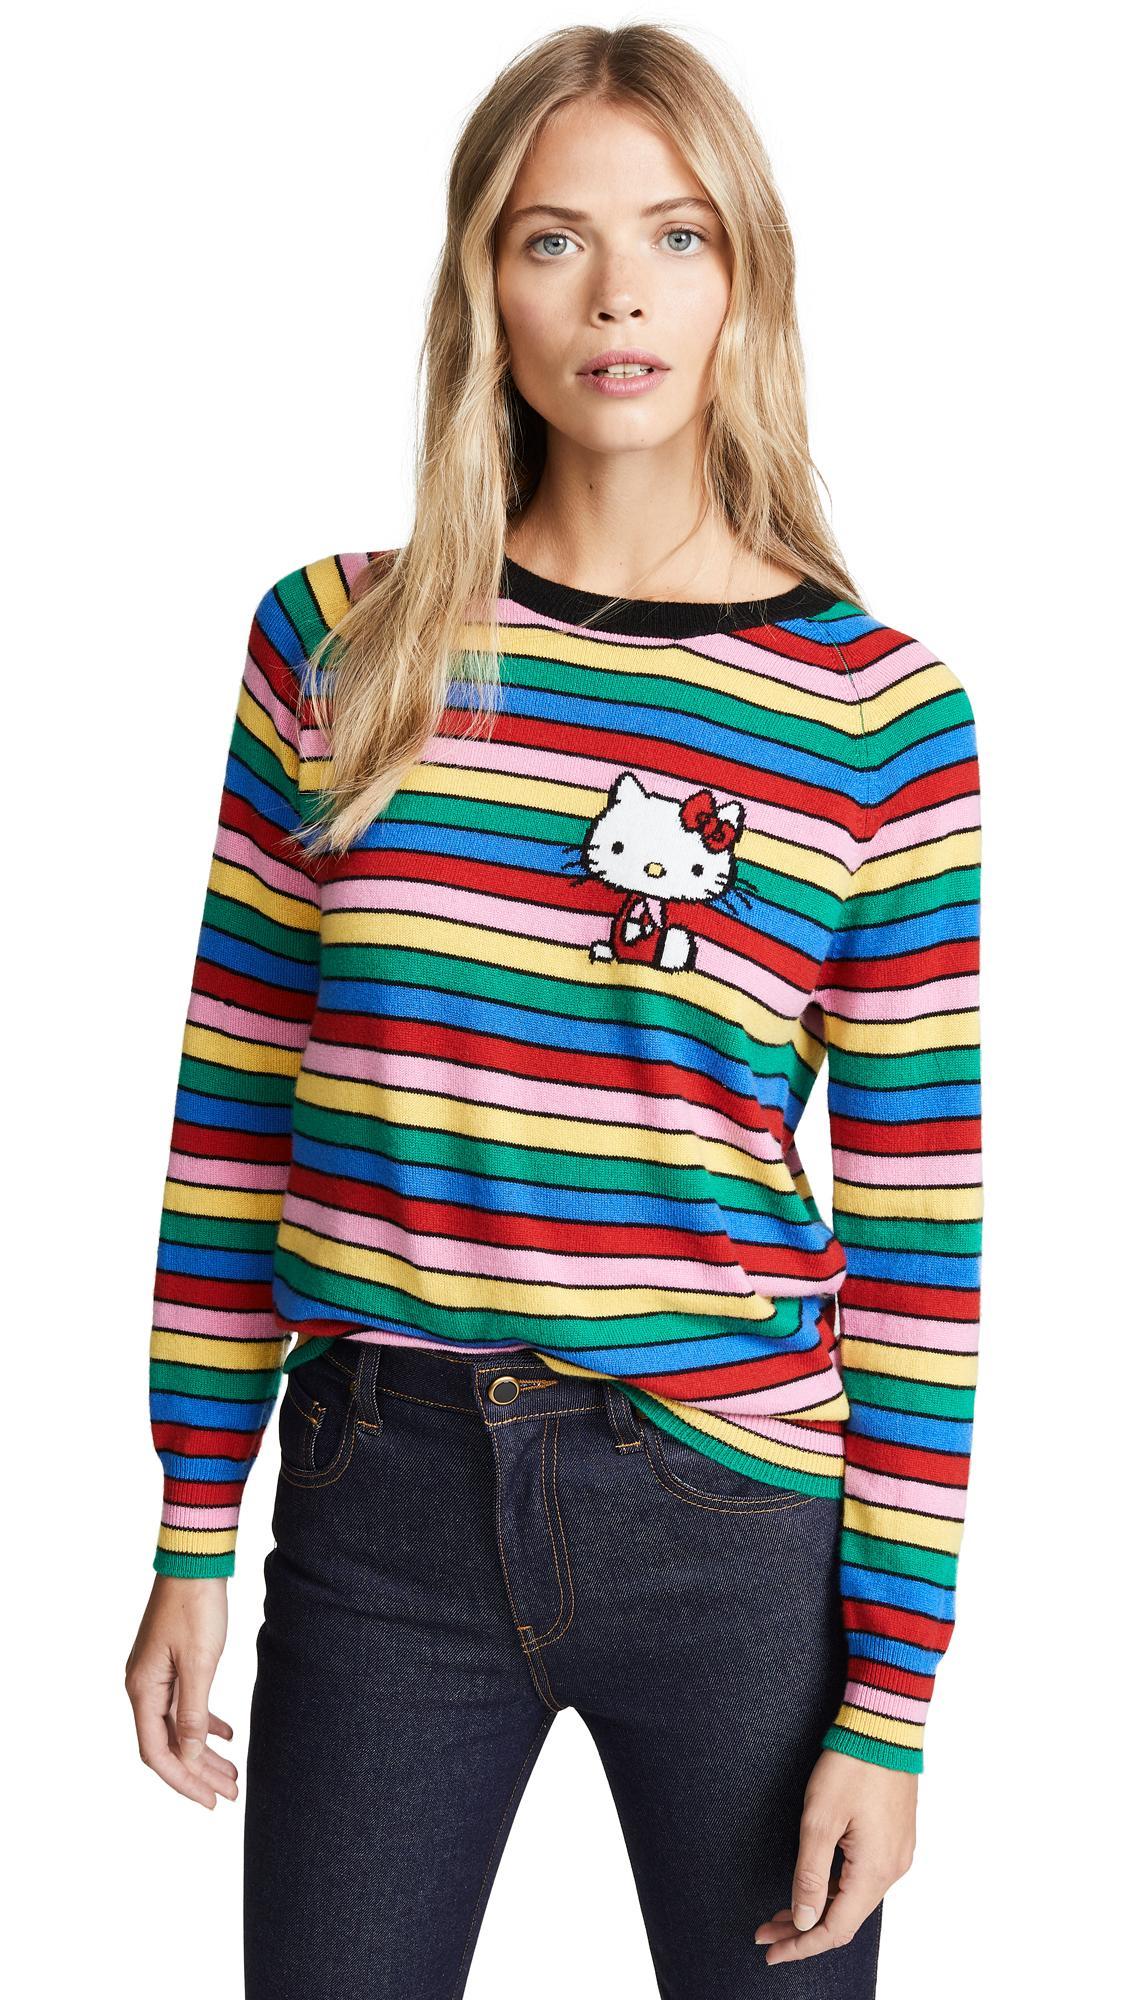 d94b30eec Chinti & Parker Hello Kitty Rainbow Stripe Cashmere Sweater In Multi ...